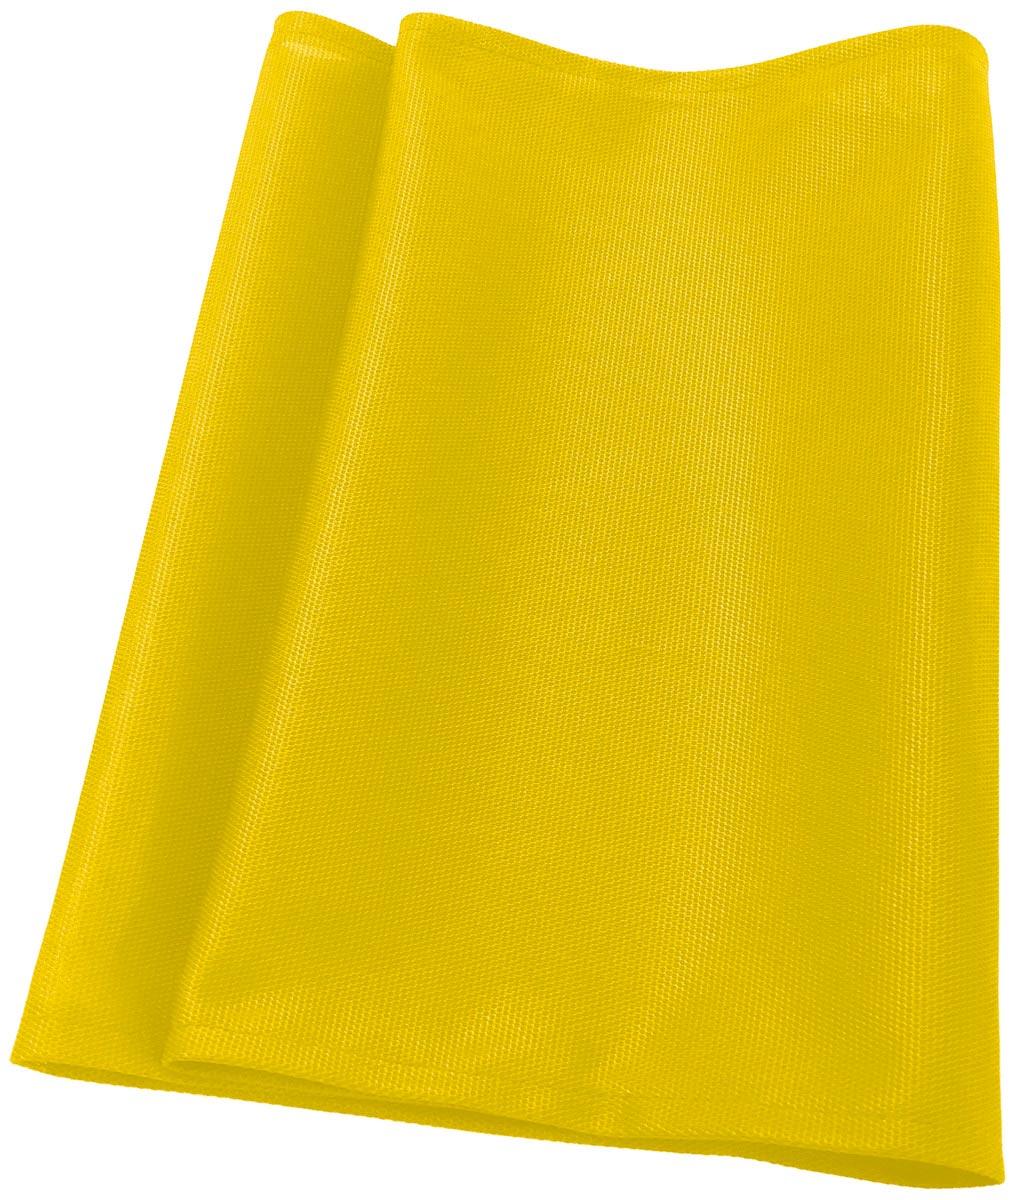 Filterüberzug IDEAL AP30/40 - Gelb